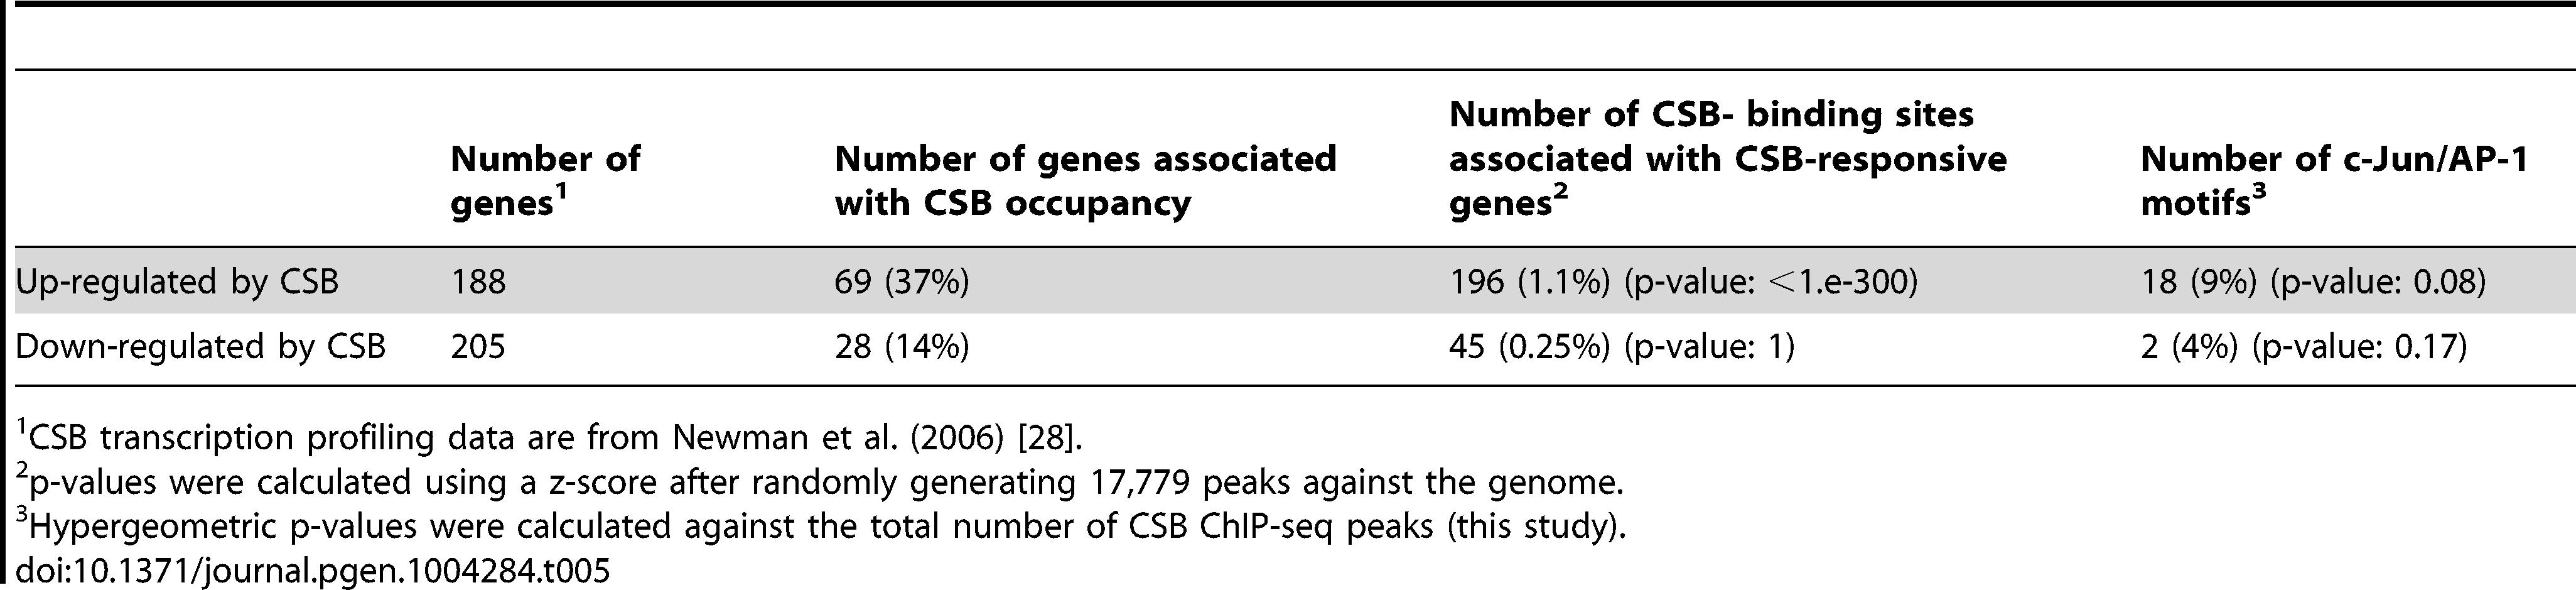 Correlation of CSB ChIP-seq data with CSB transcription profiling data of Newman et al. (2006).